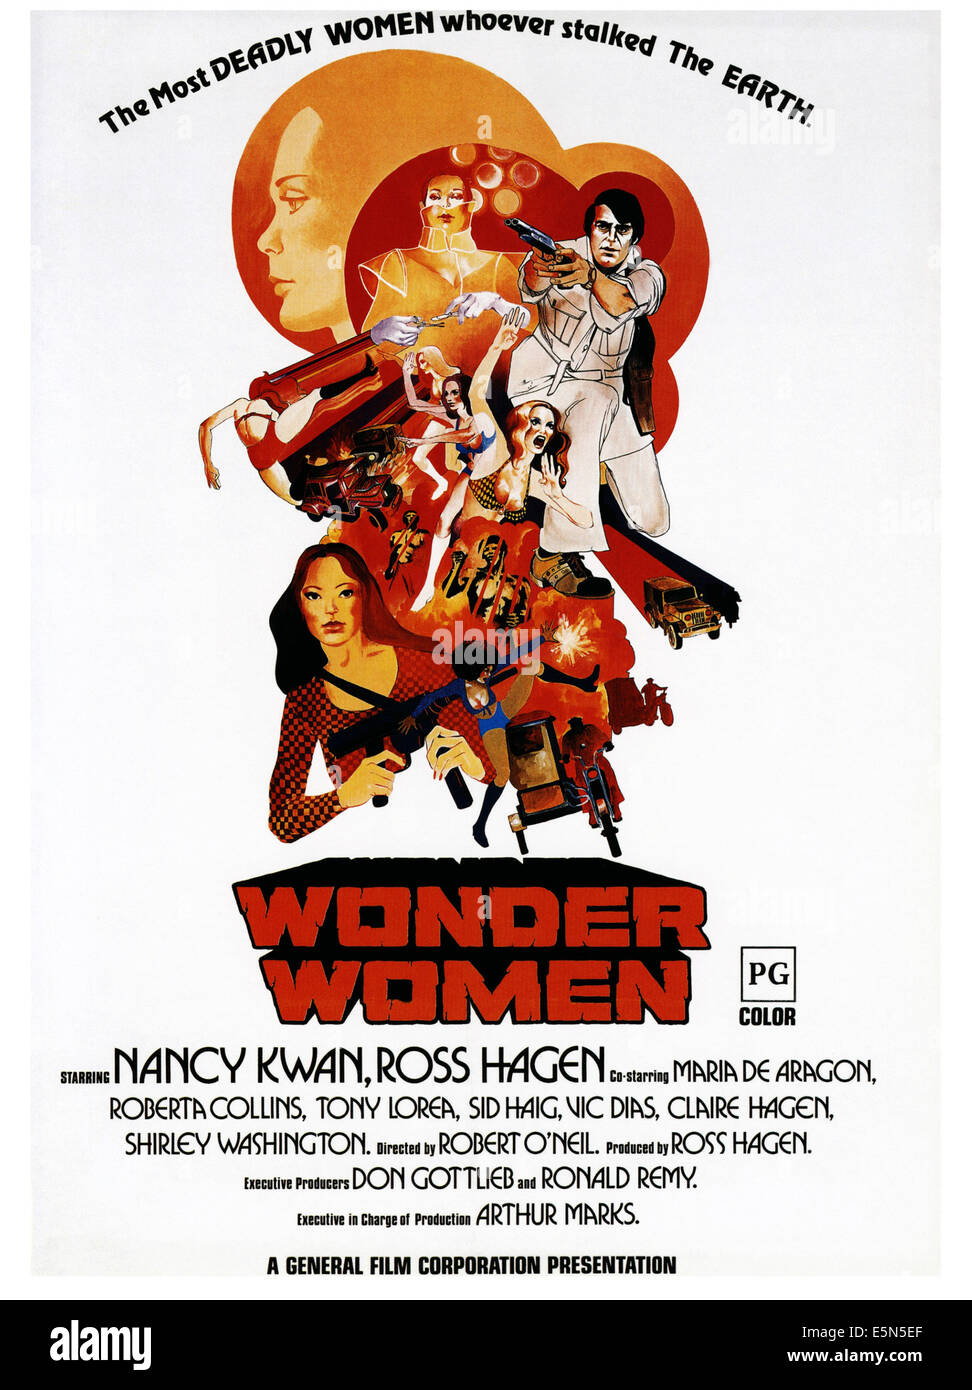 WONDER WOMEN, poster art, 1973. - Stock Image